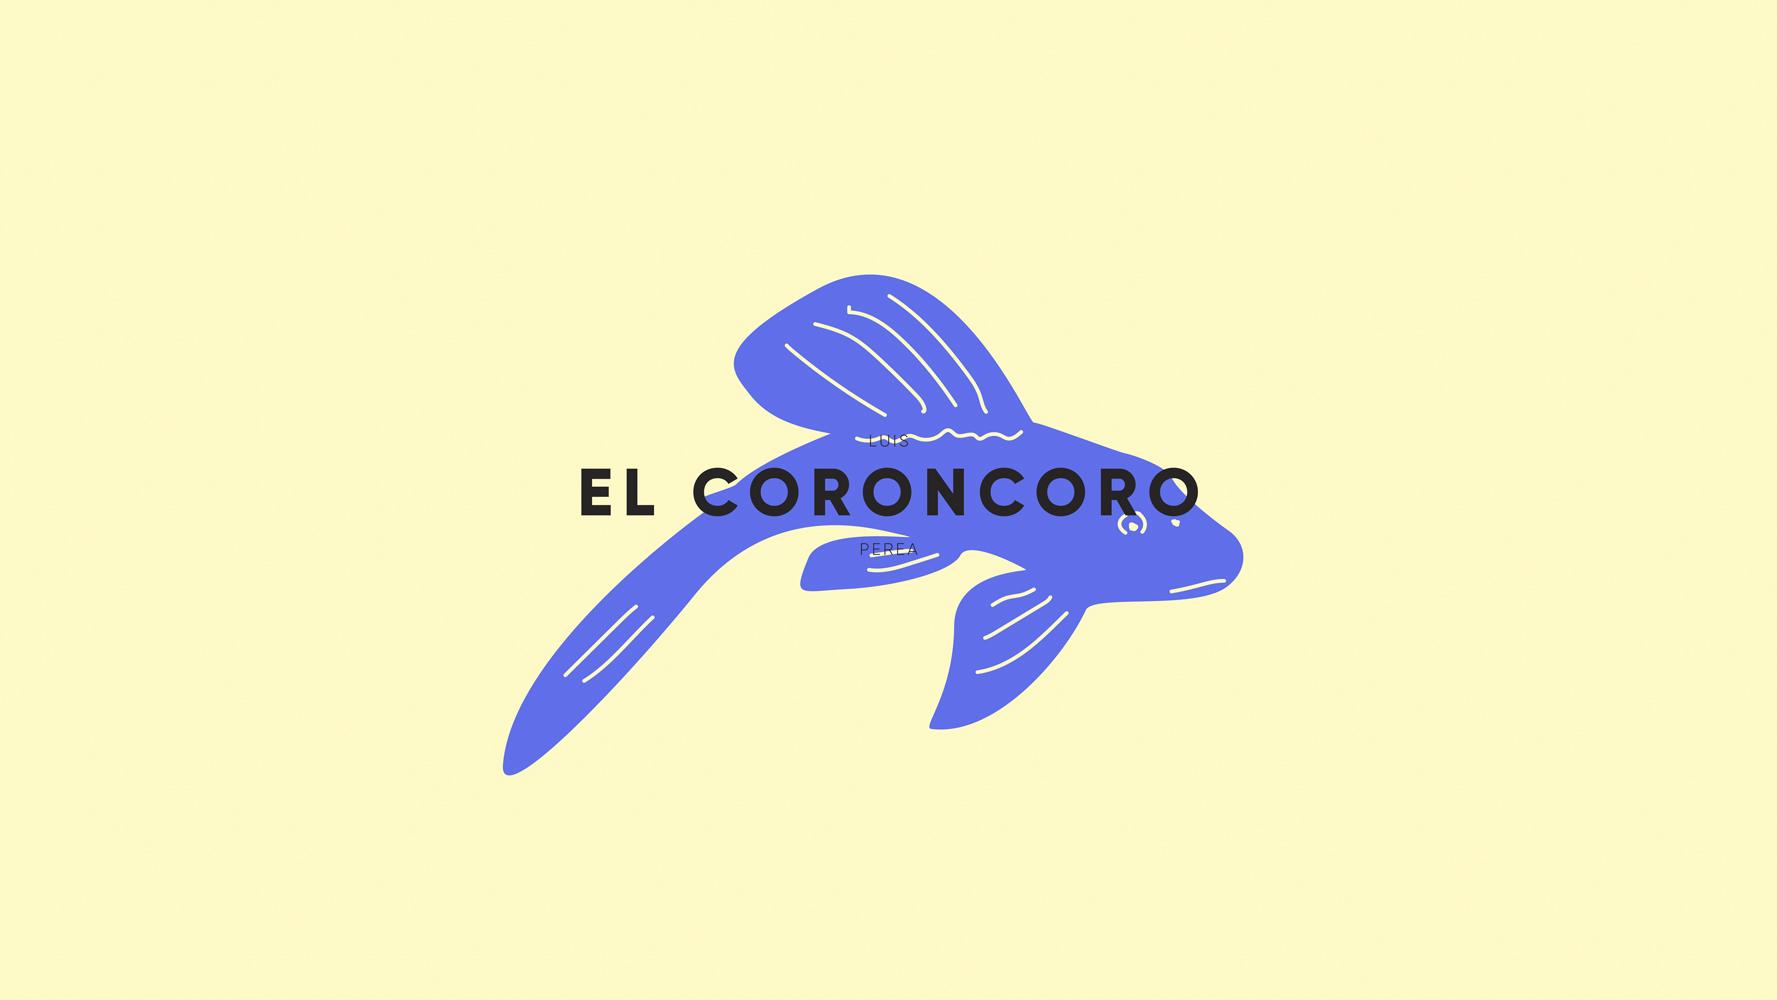 3ElCoroncoroW.jpg